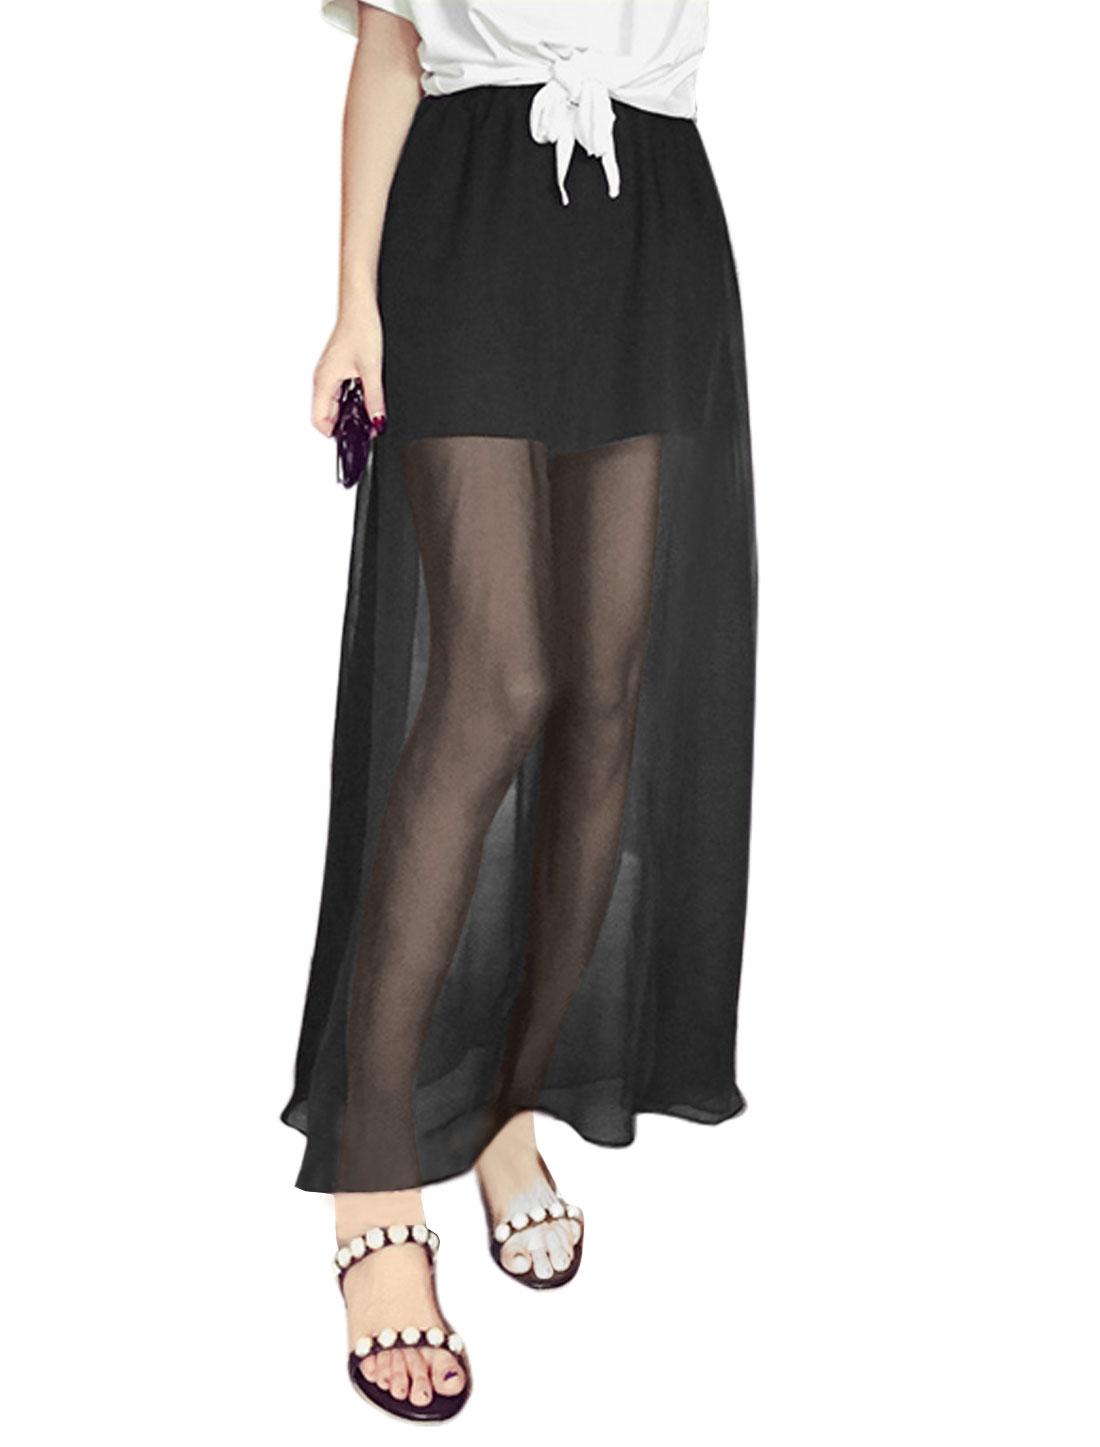 Ladies Mid Rise Elastic Waist Layered Full-Length Casual Skorts Black S